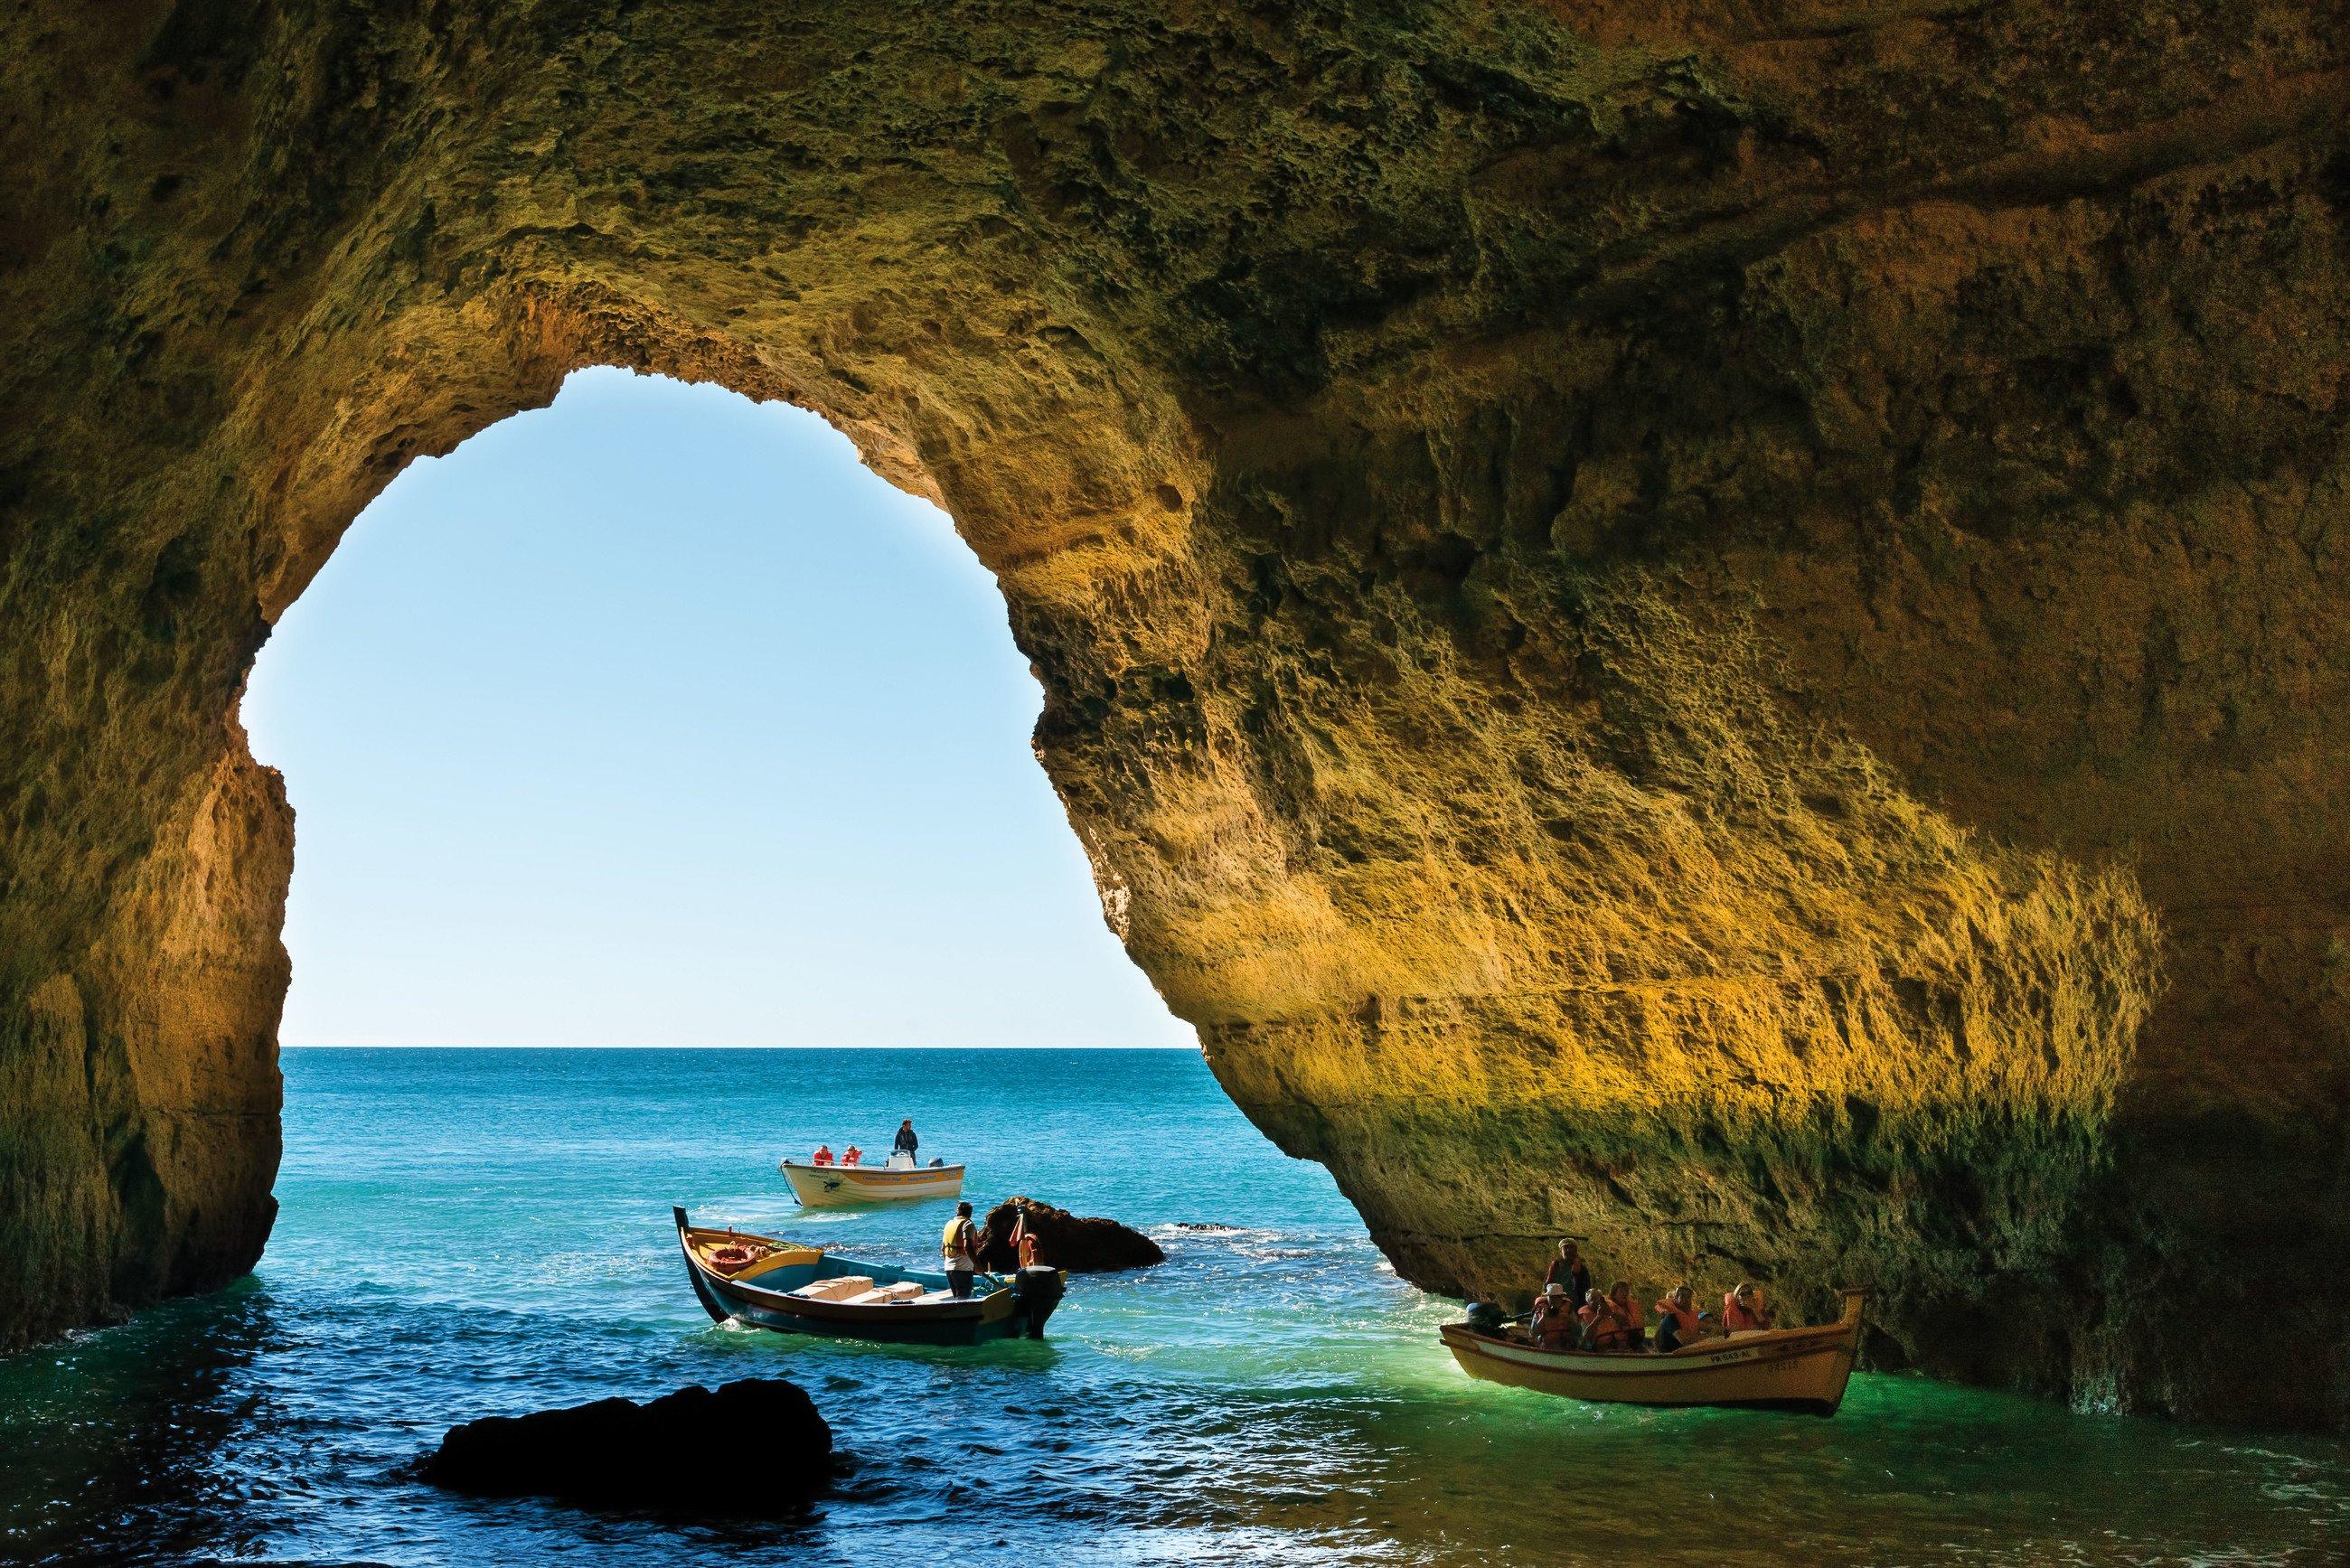 Sea Grotto Cruise